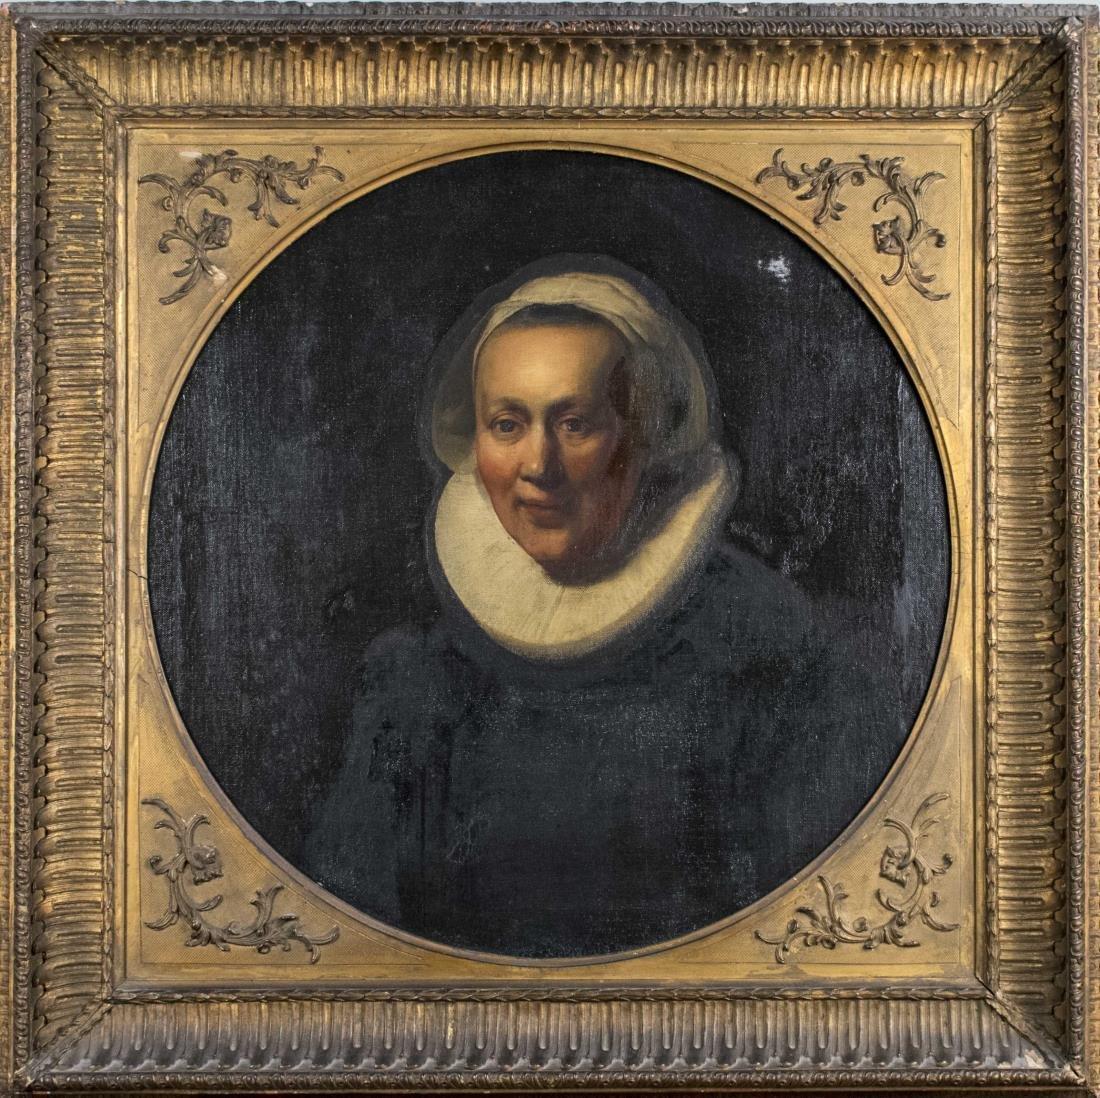 Portrait of A Woman (18th Century)